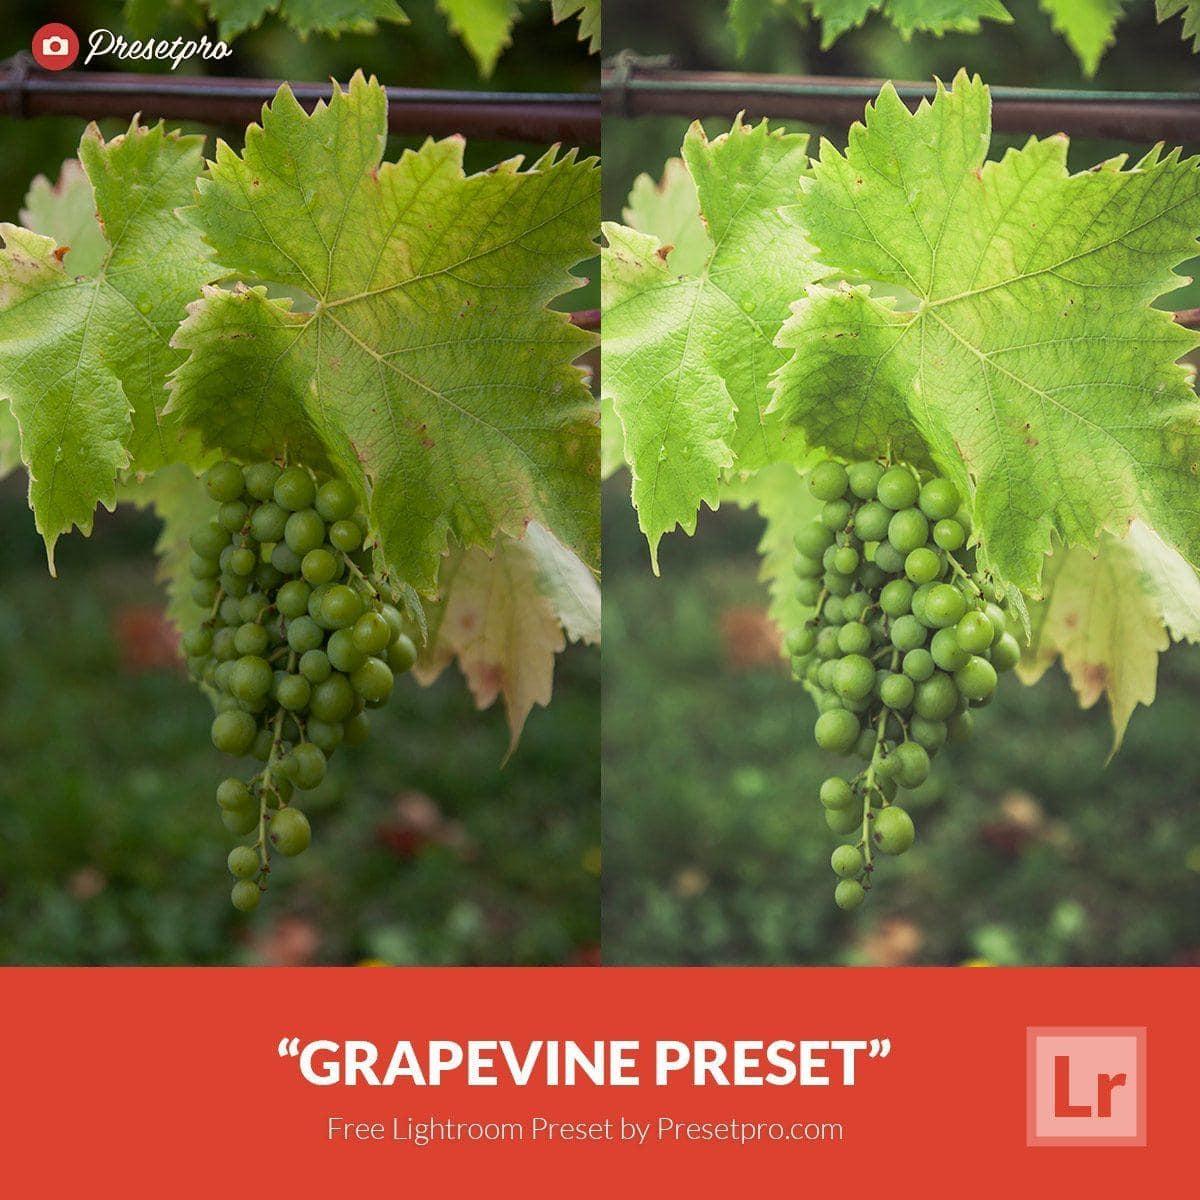 Free-Lightroom-Preset-Grapevine